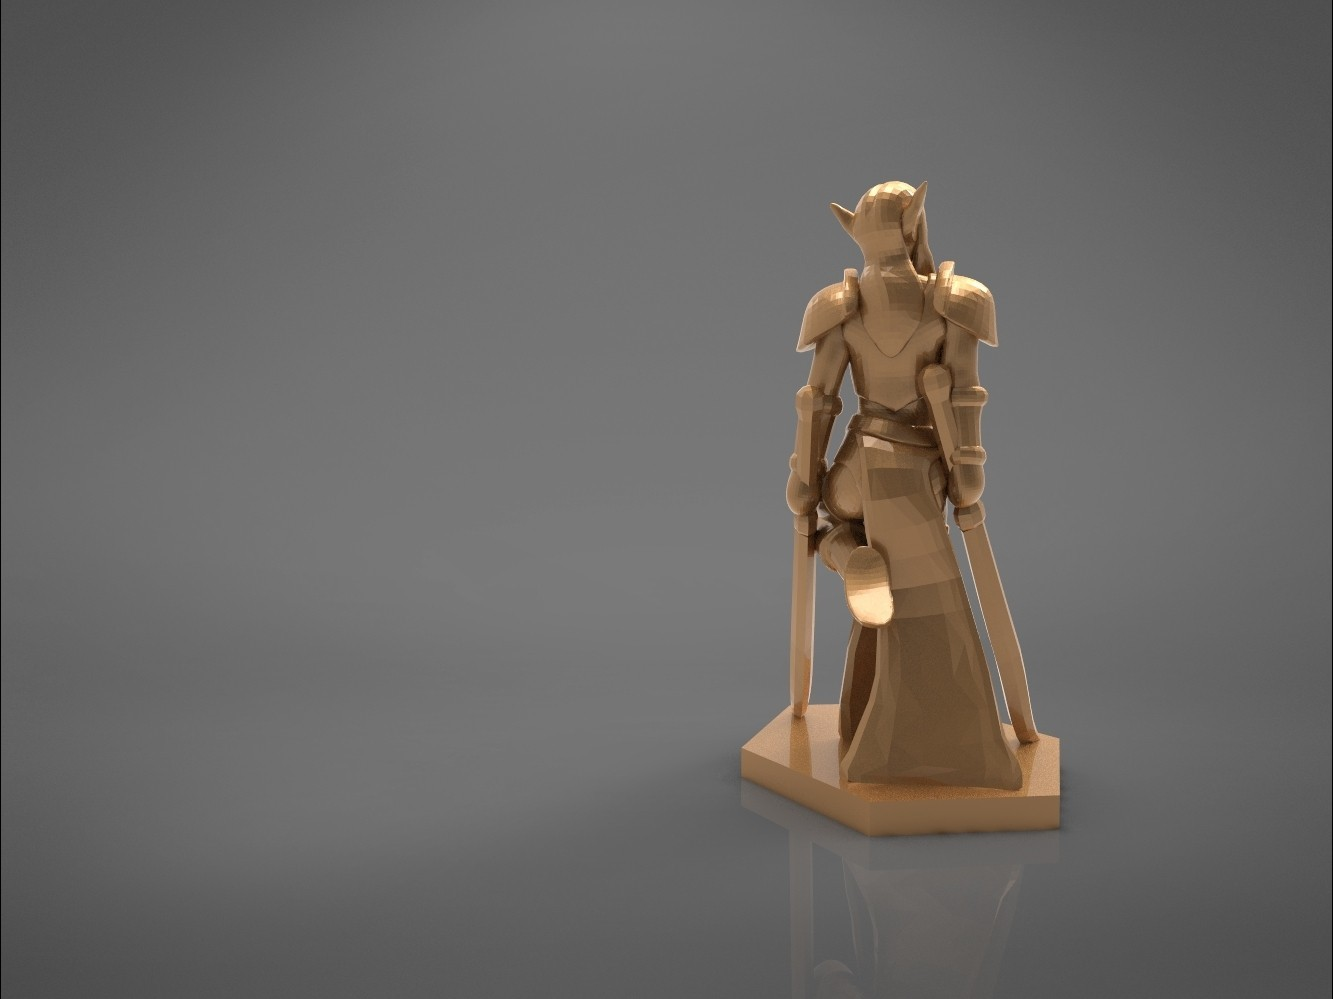 Warrior_2-main_render_2.327.jpg Download STL file ELF WARRIOR FEMALE CHARACTER GAME FIGURE 3D print model • 3D printing object, 3D-mon